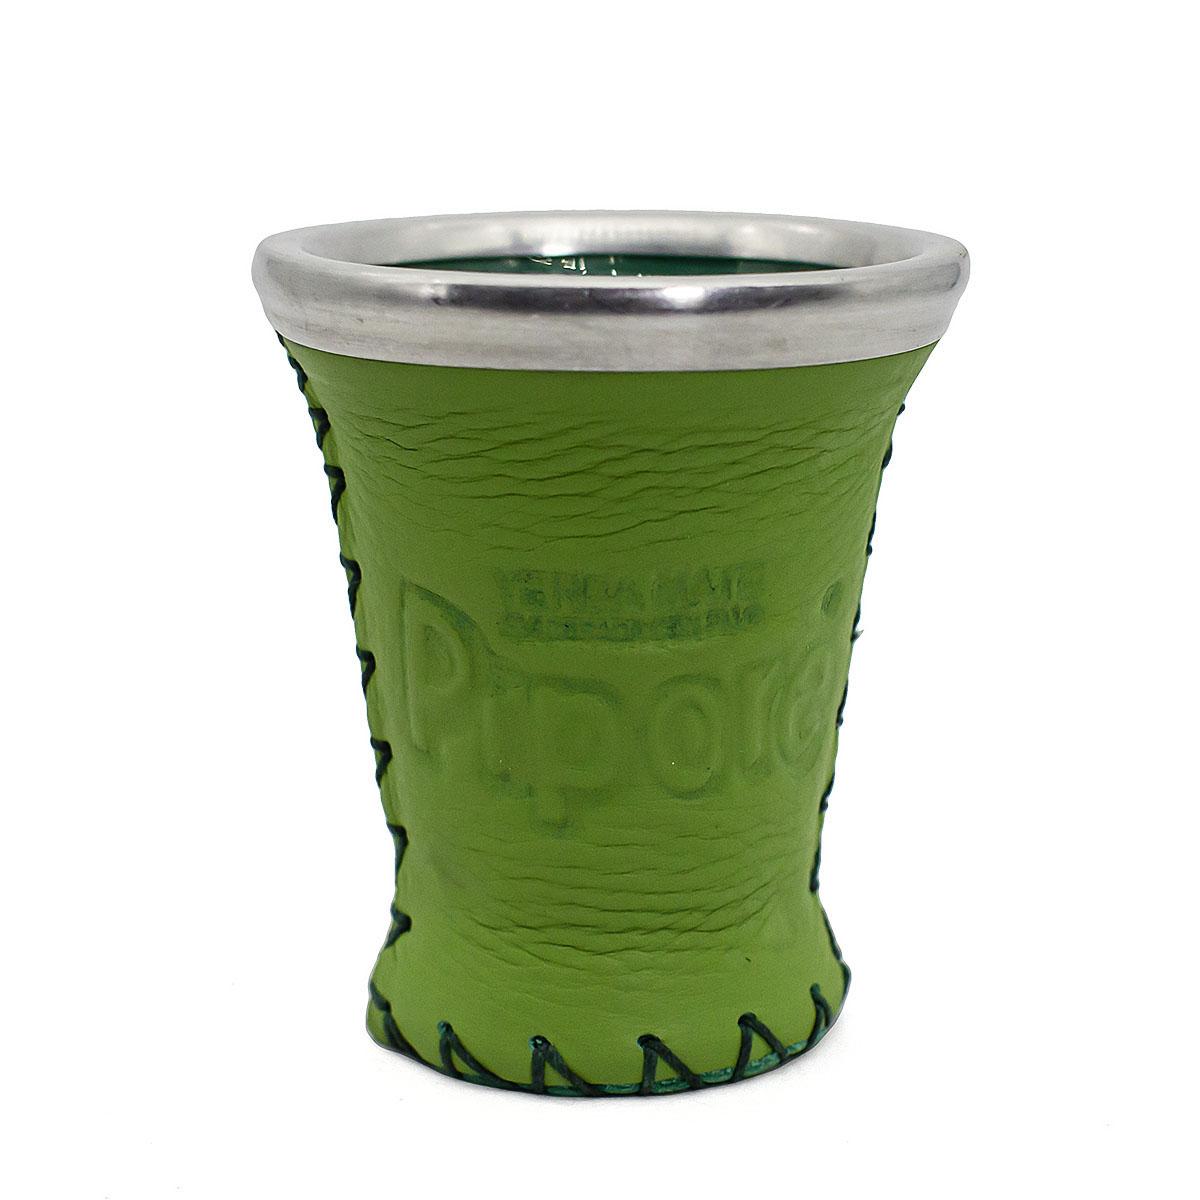 Калабас Pipore зеленый, 150 мл калабас гранд чако